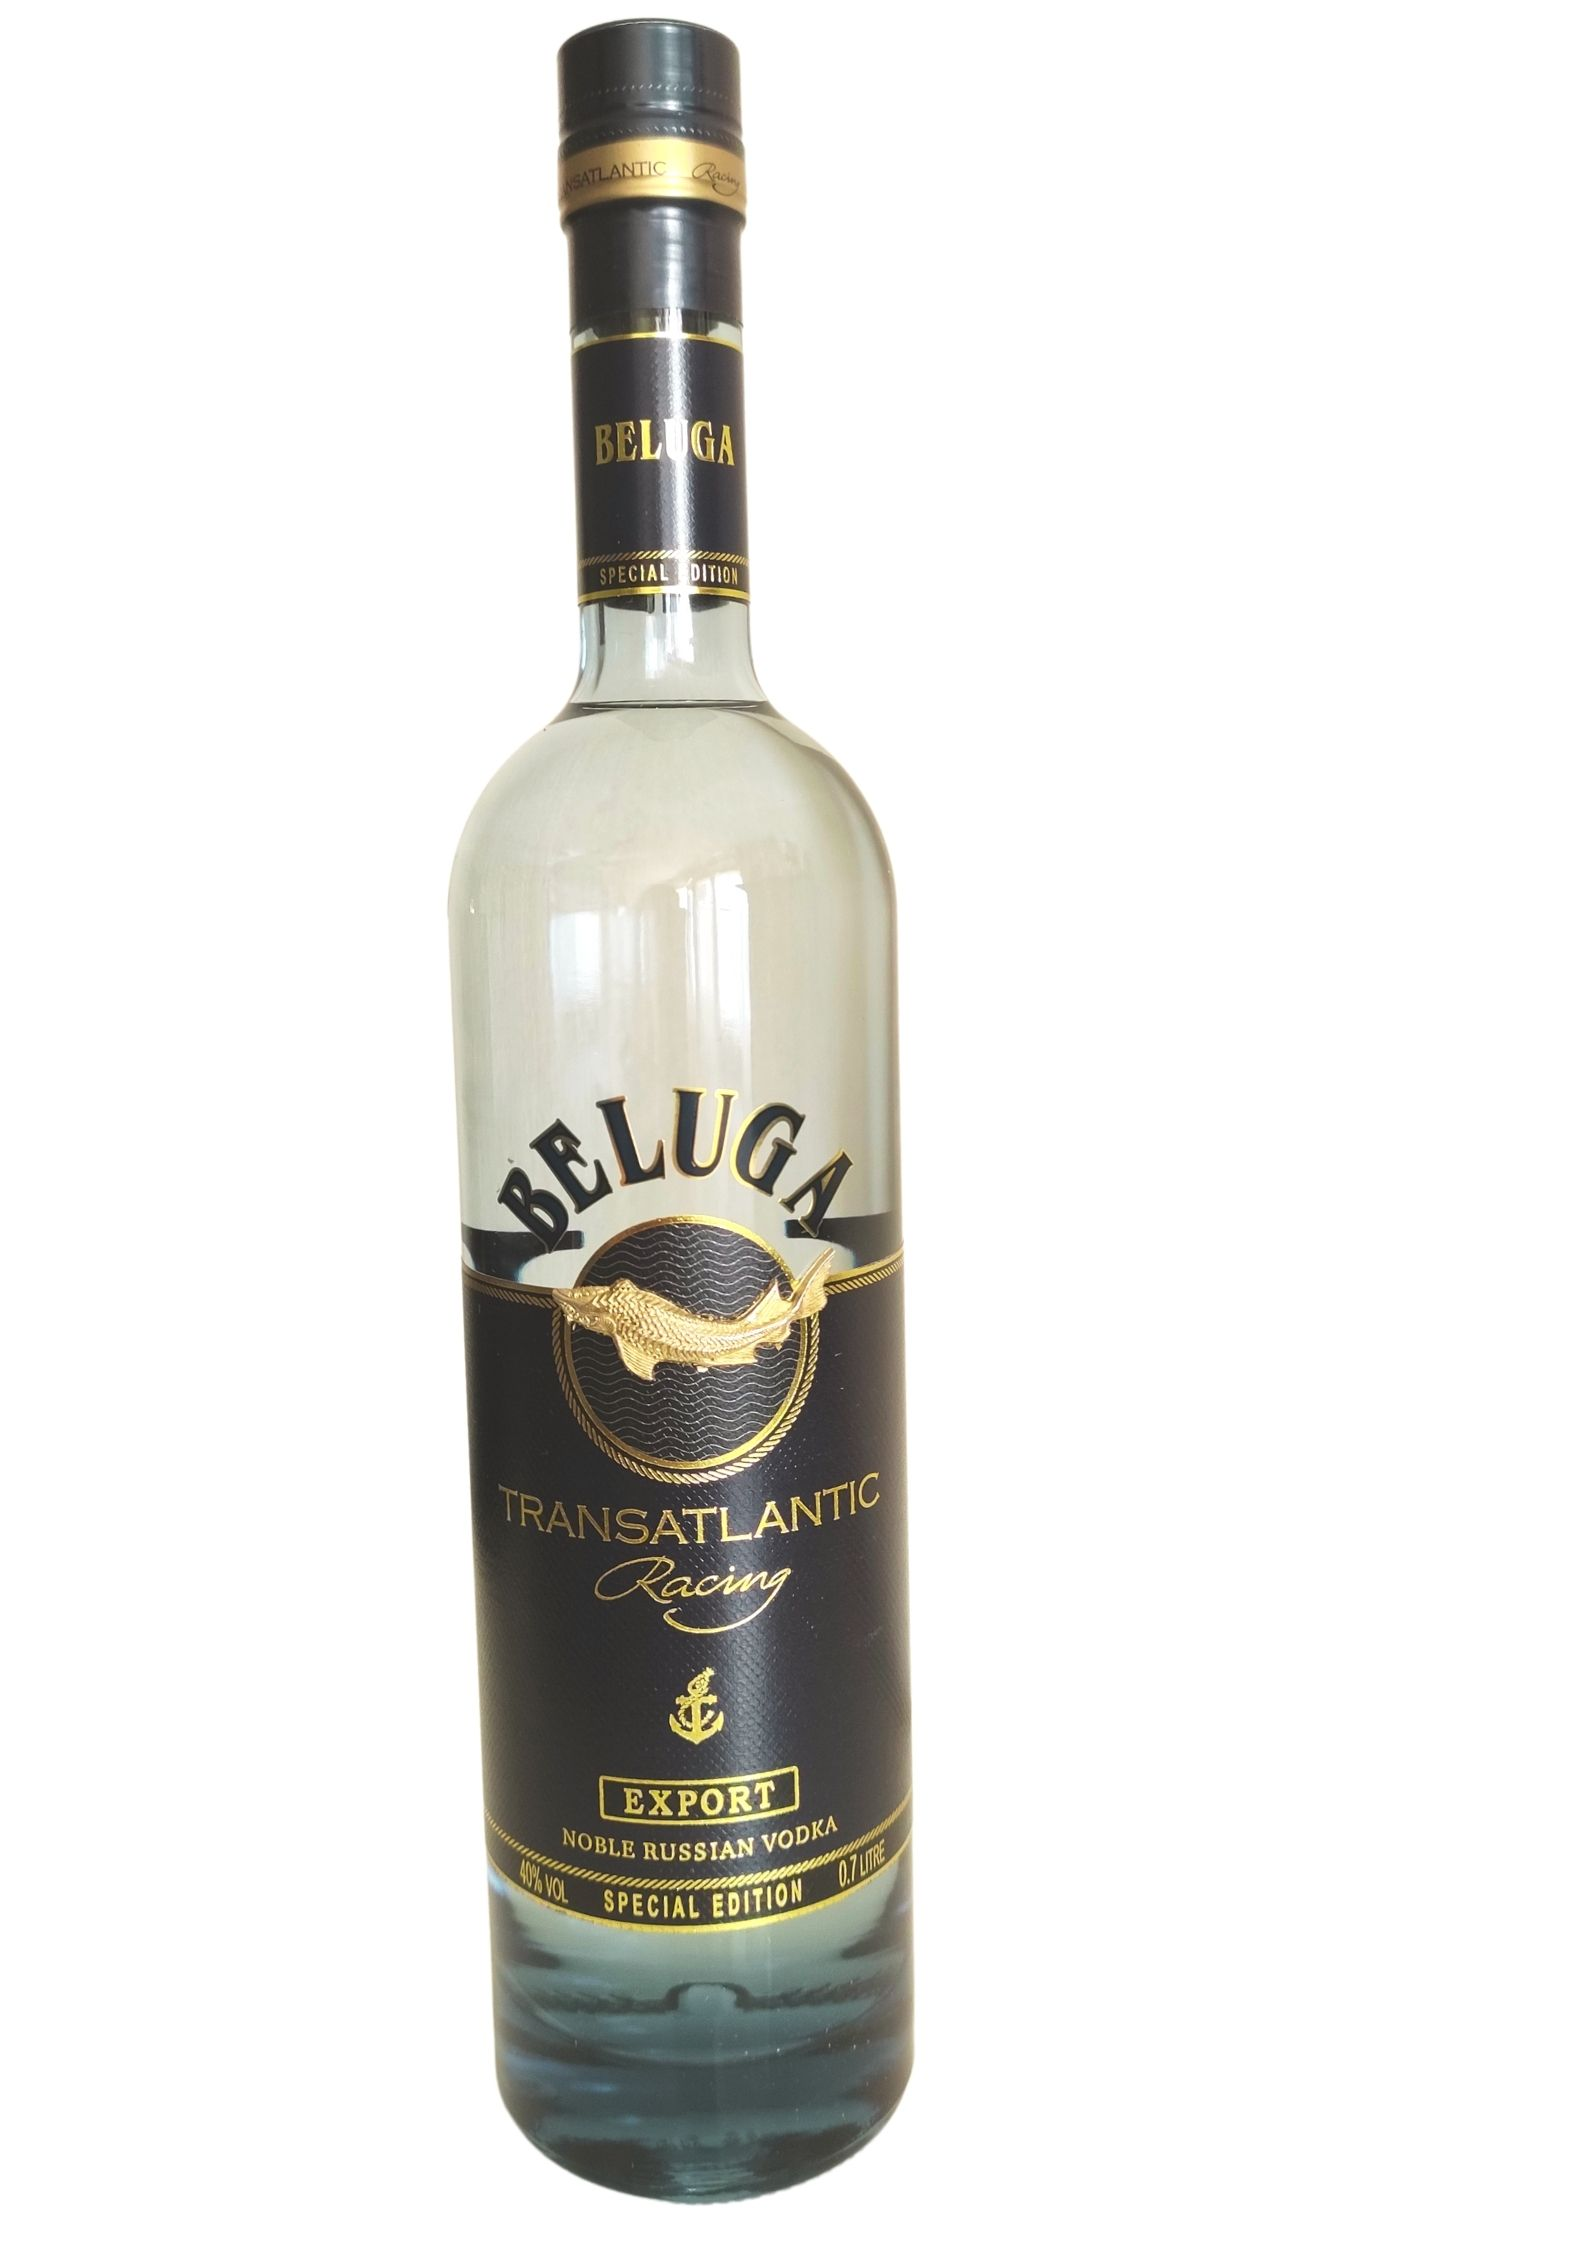 Vodka Beluga Transatlantic Racing Export Edition limitée